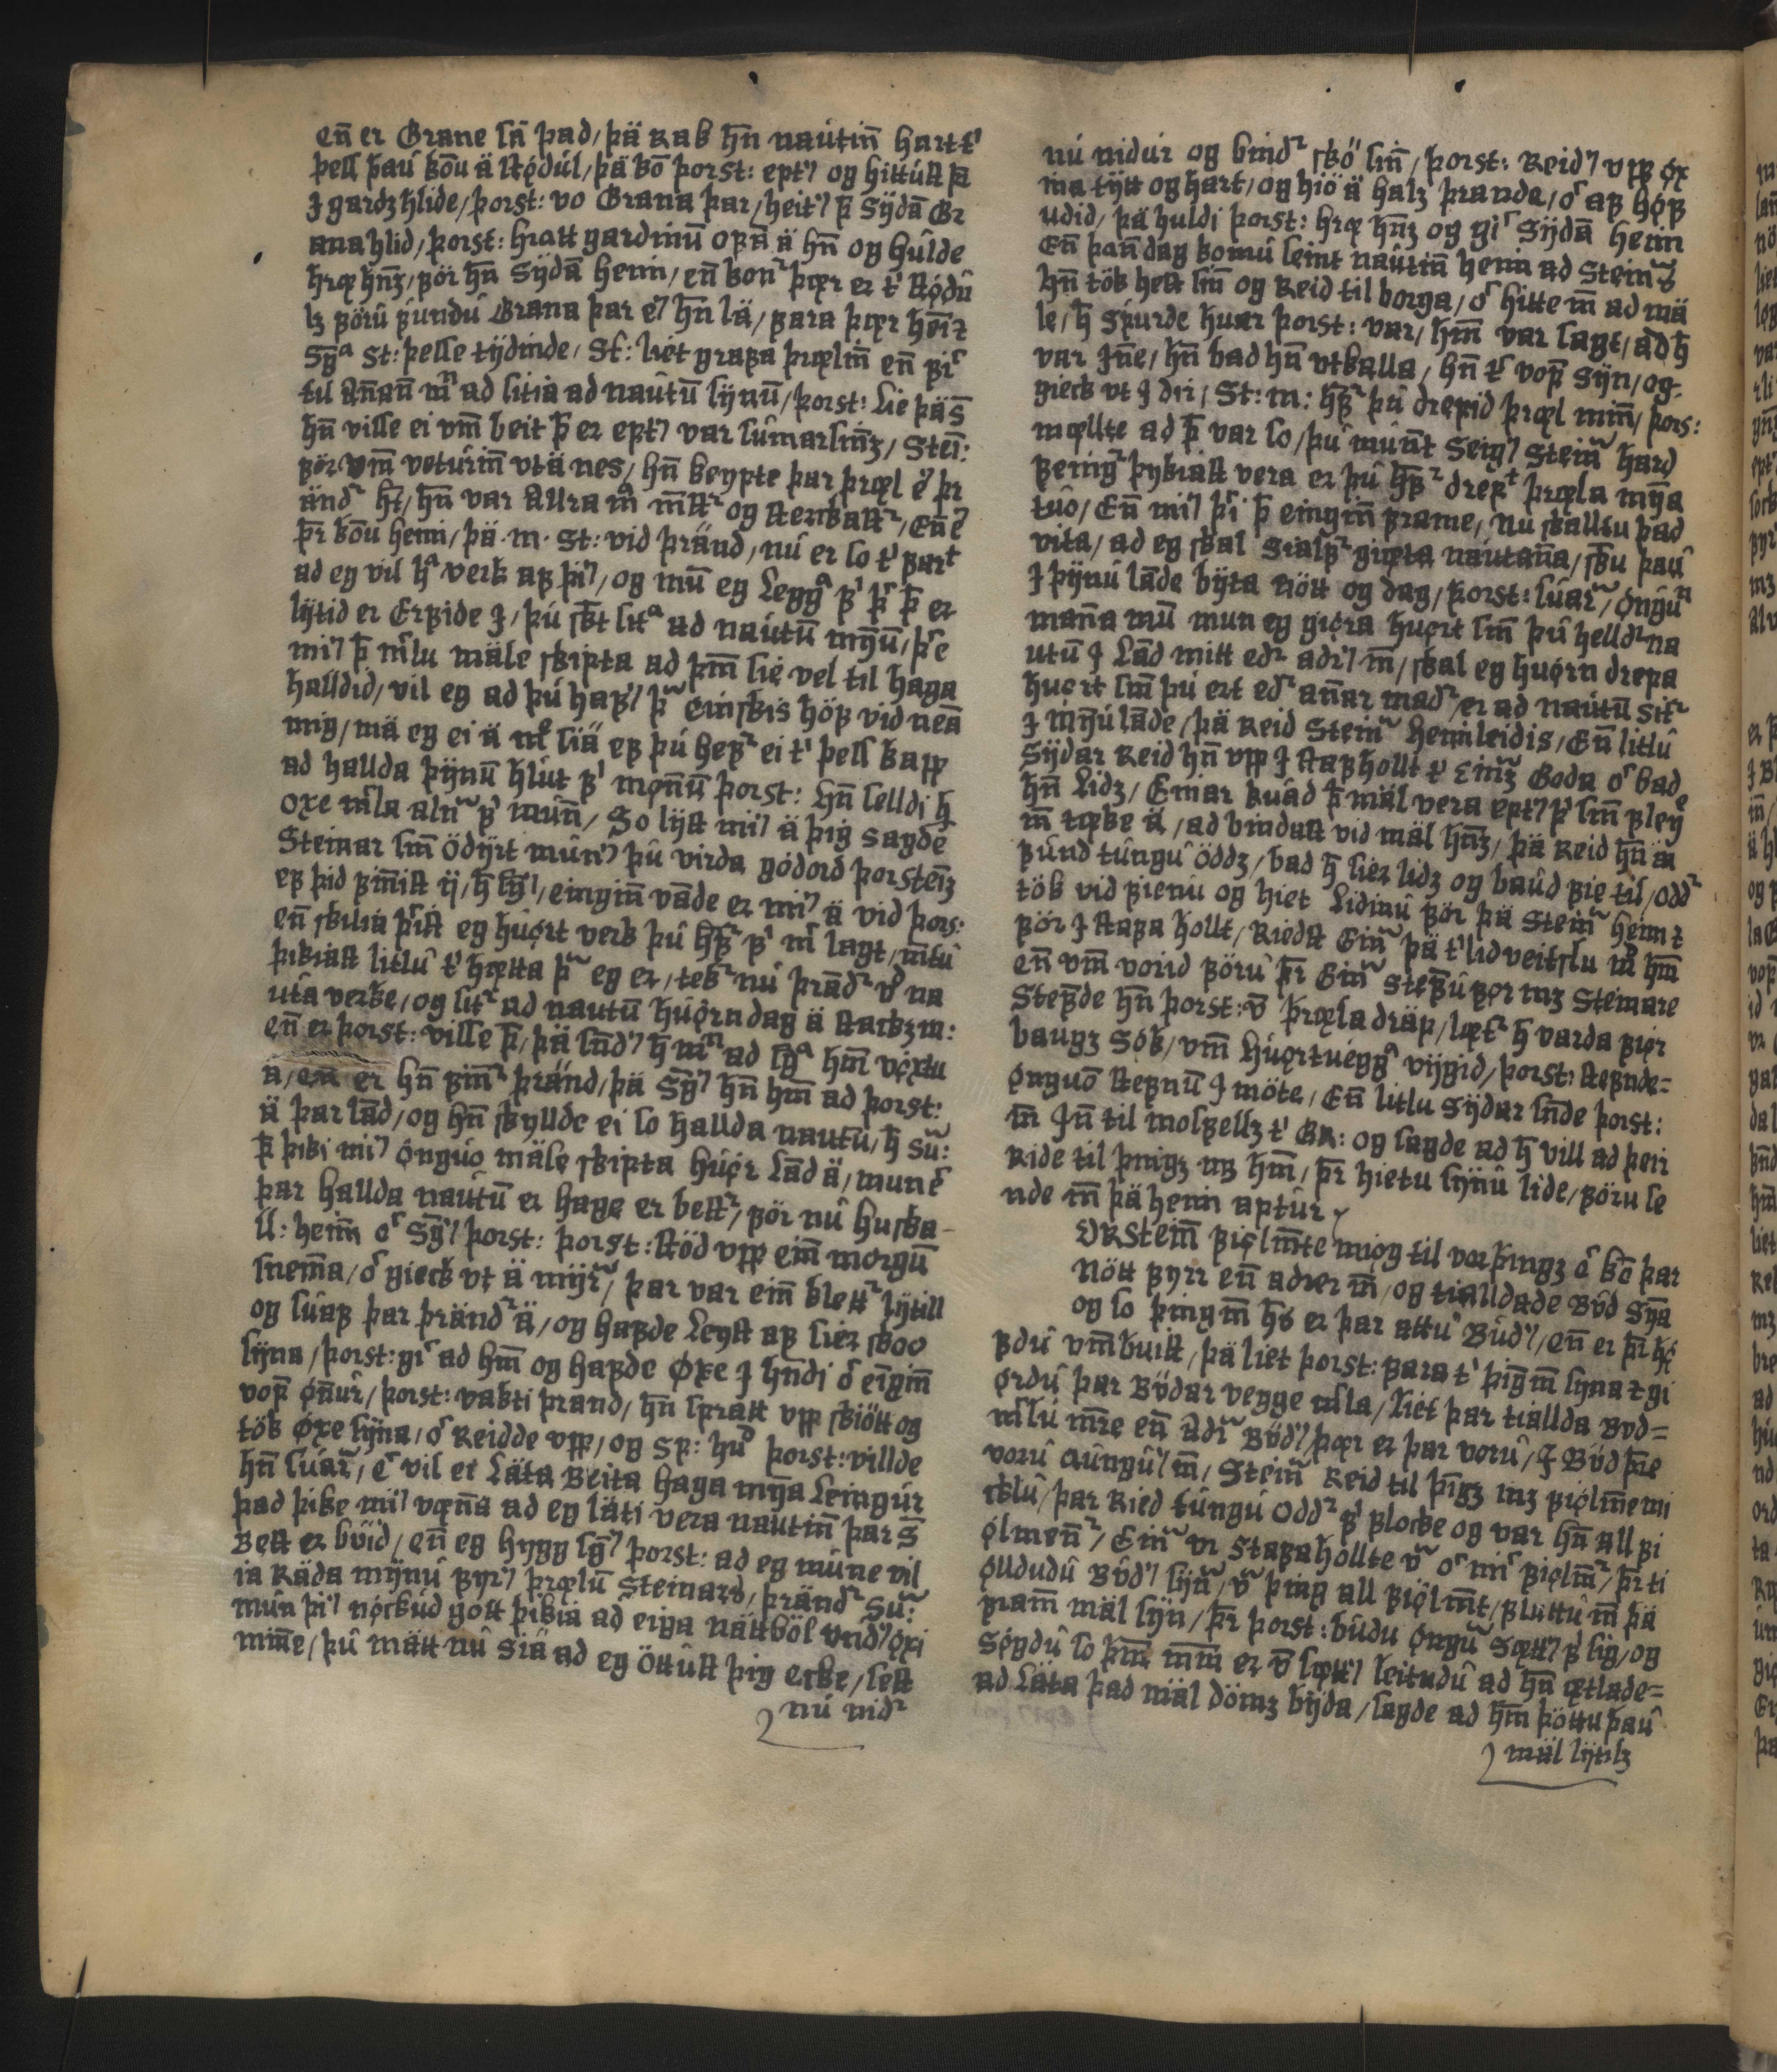 AM 128 fol - 48v